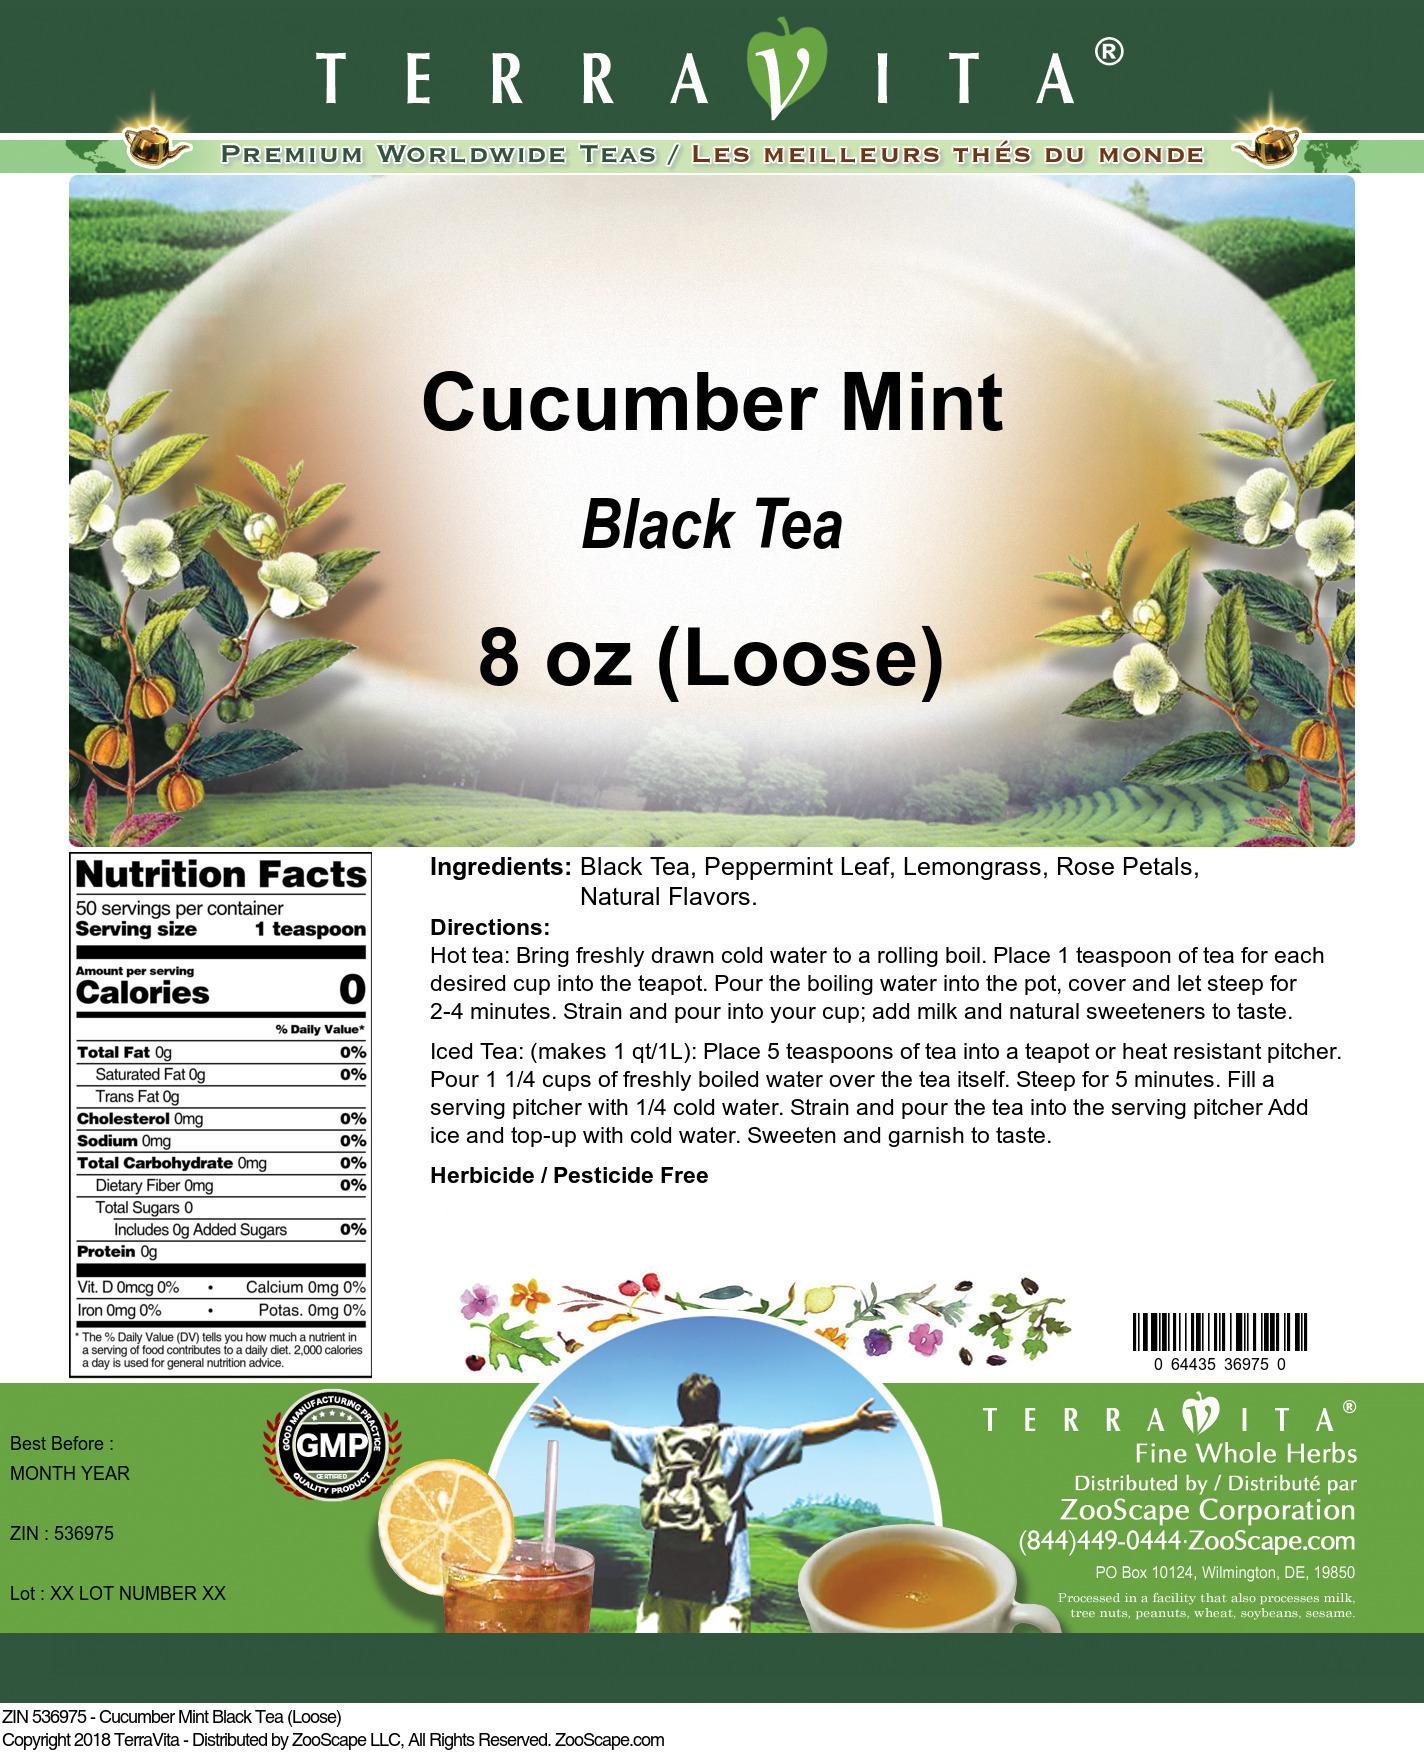 Cucumber Mint Black Tea